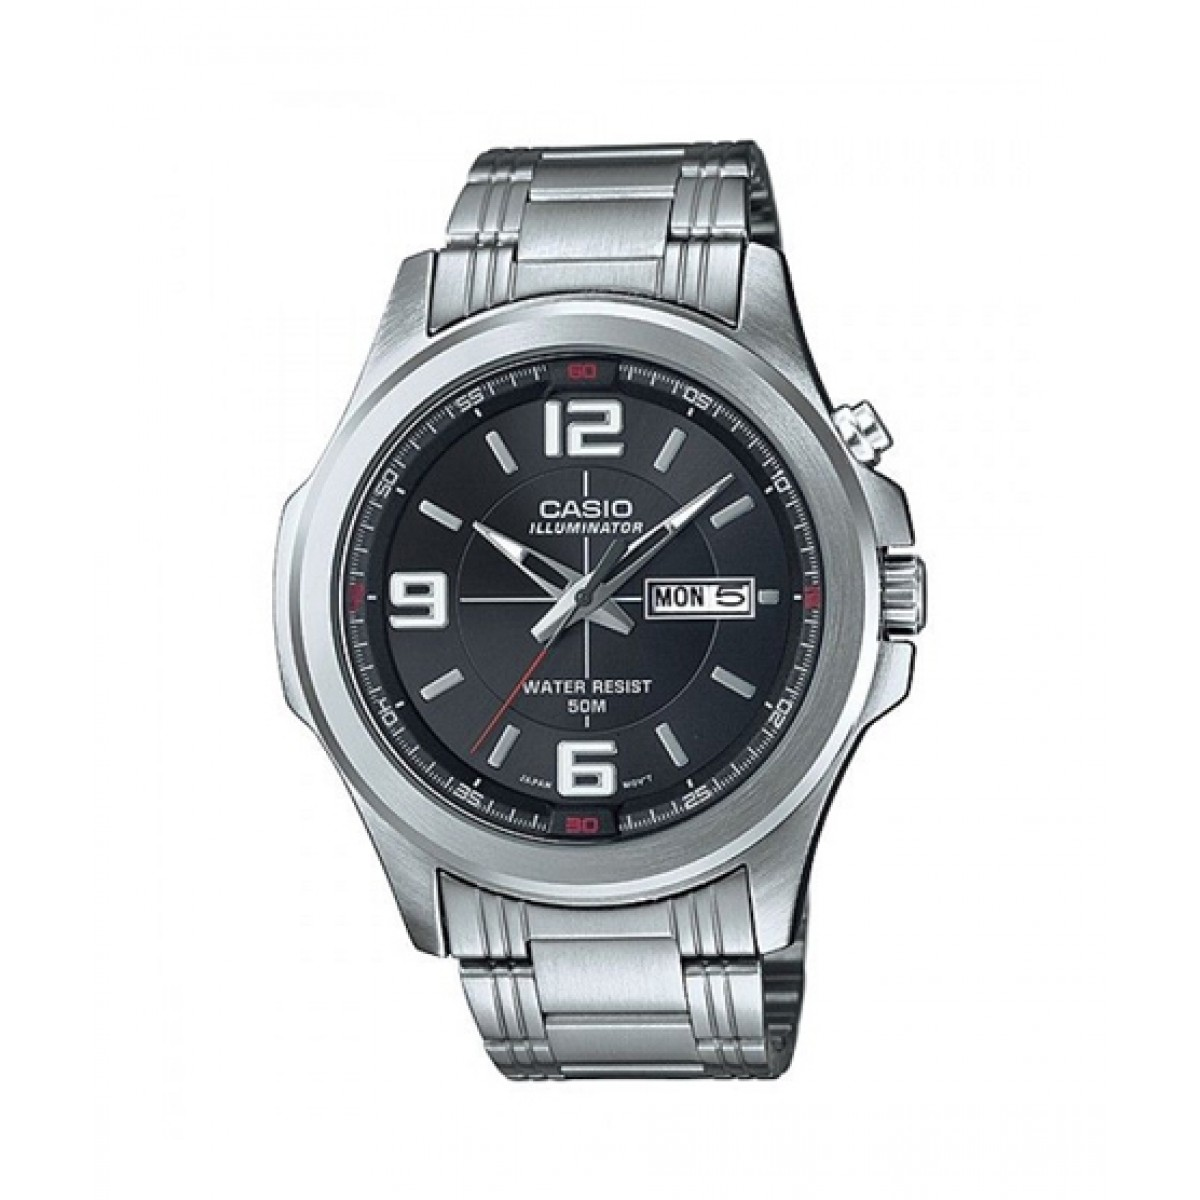 Casio Analog Watch For Men (MTP-E202D-1AVDF)